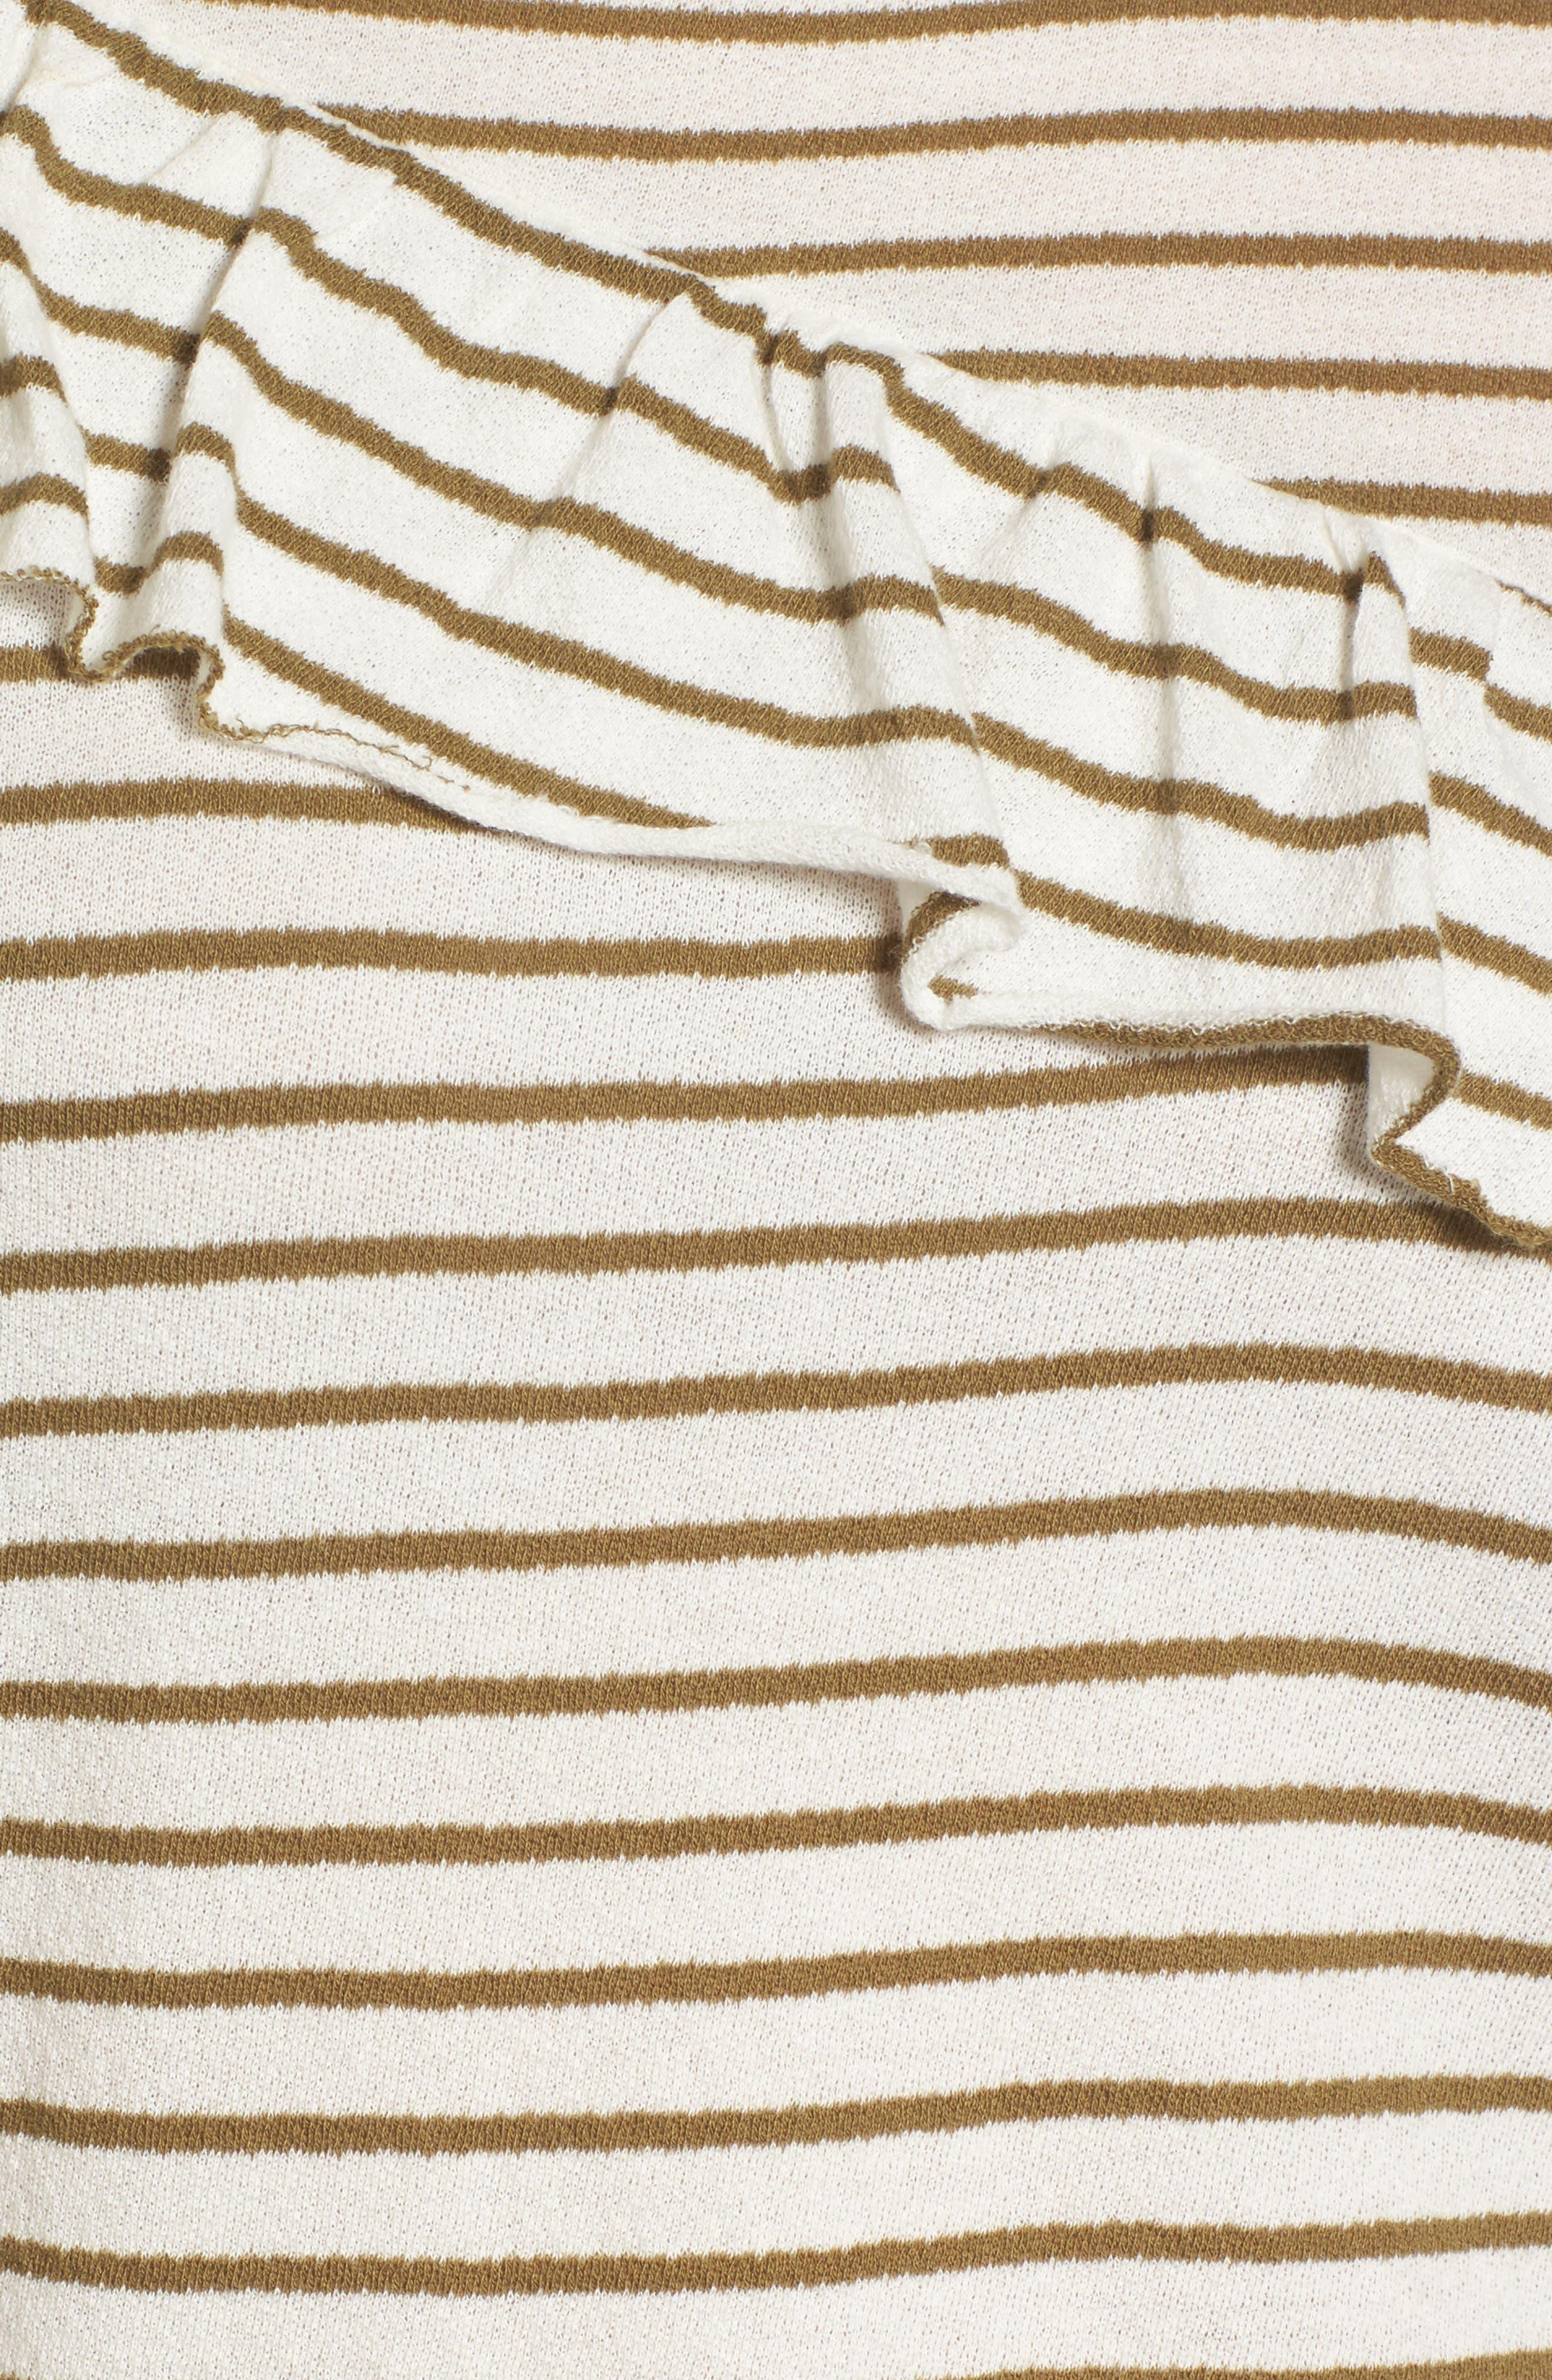 Stripe Asymmetrical Ruffle Top,                             Alternate thumbnail 5, color,                             310